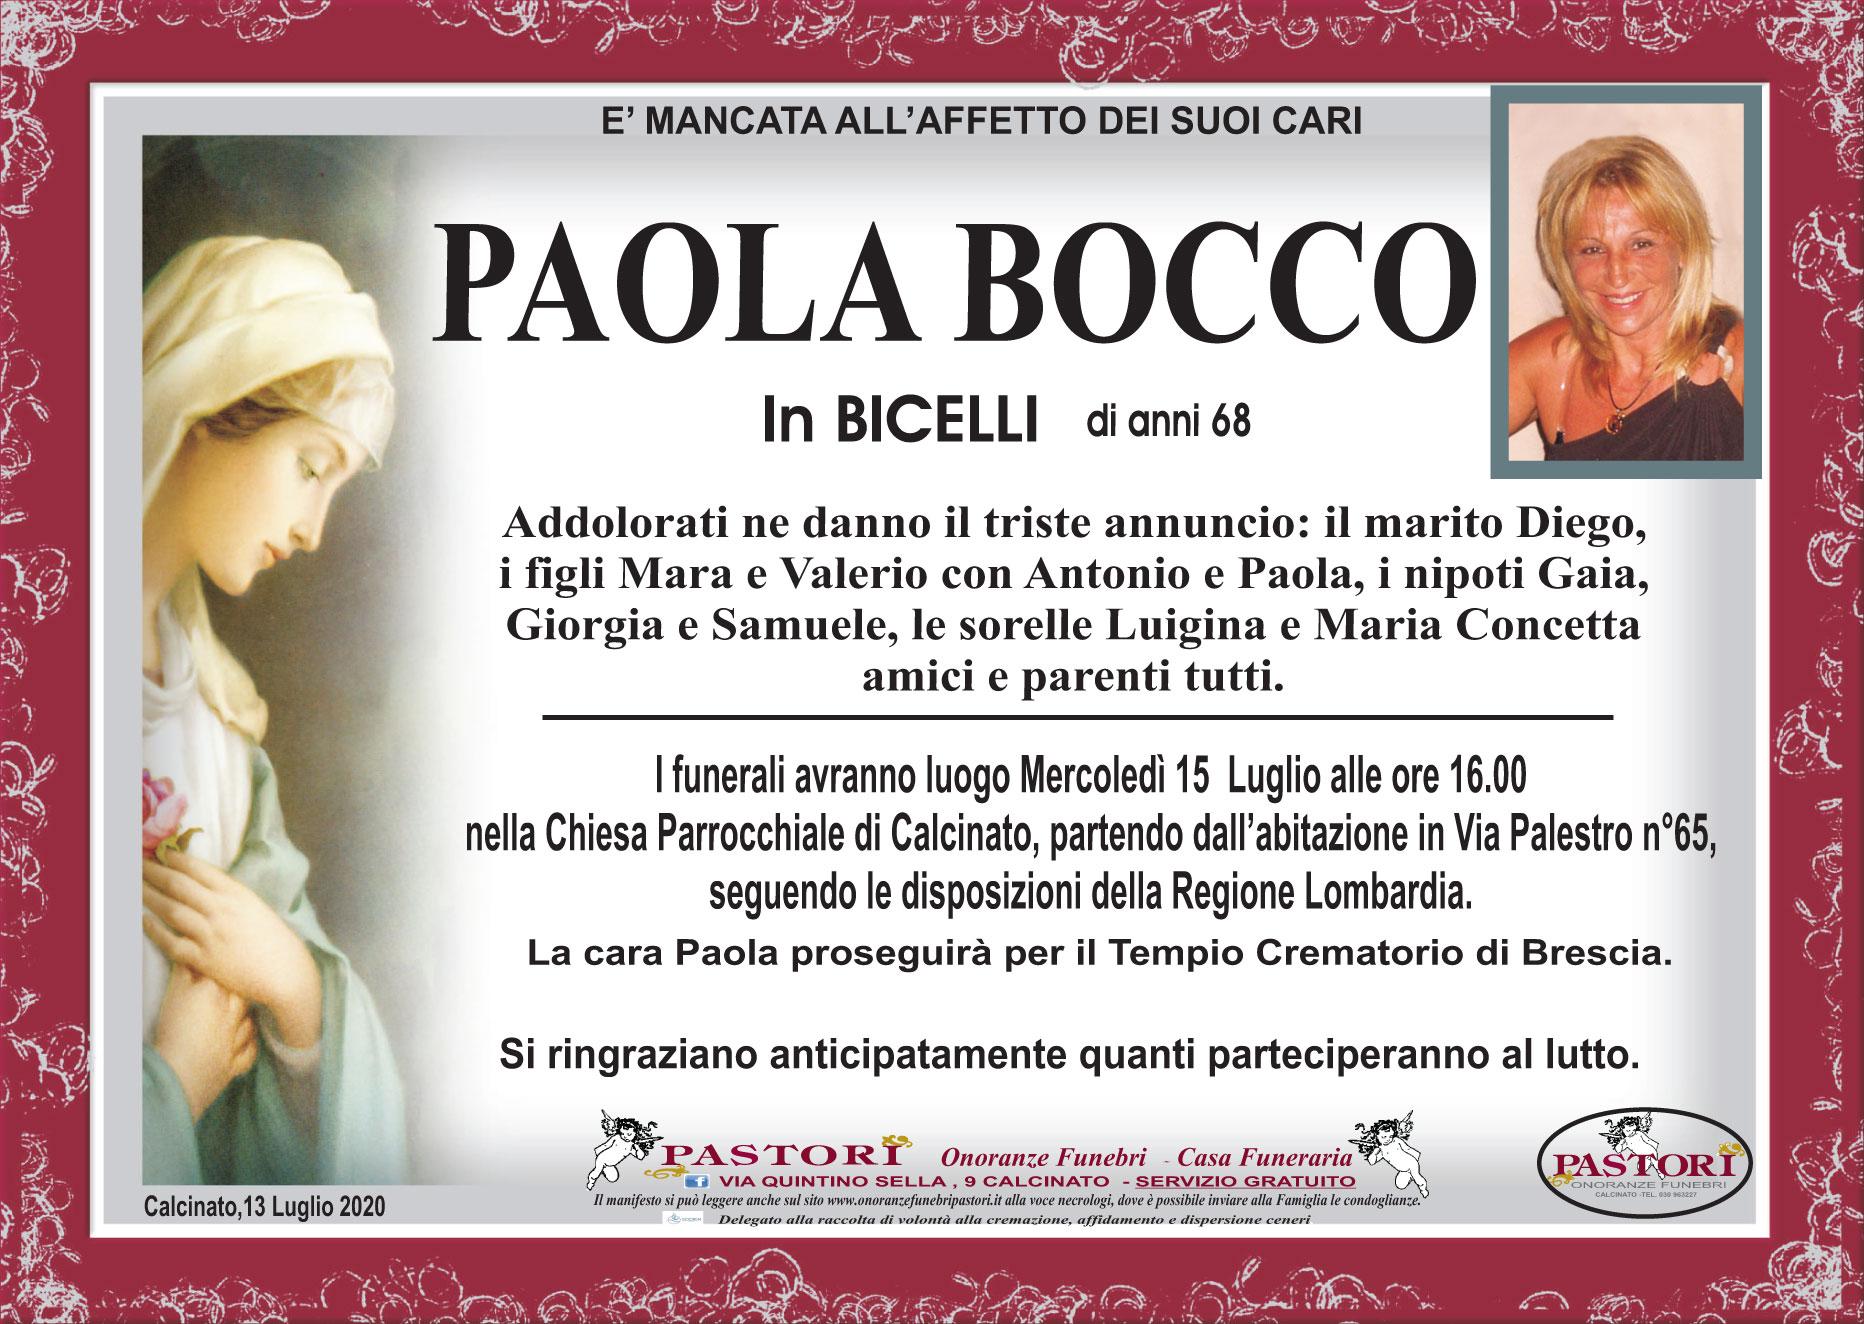 Paola Bocco